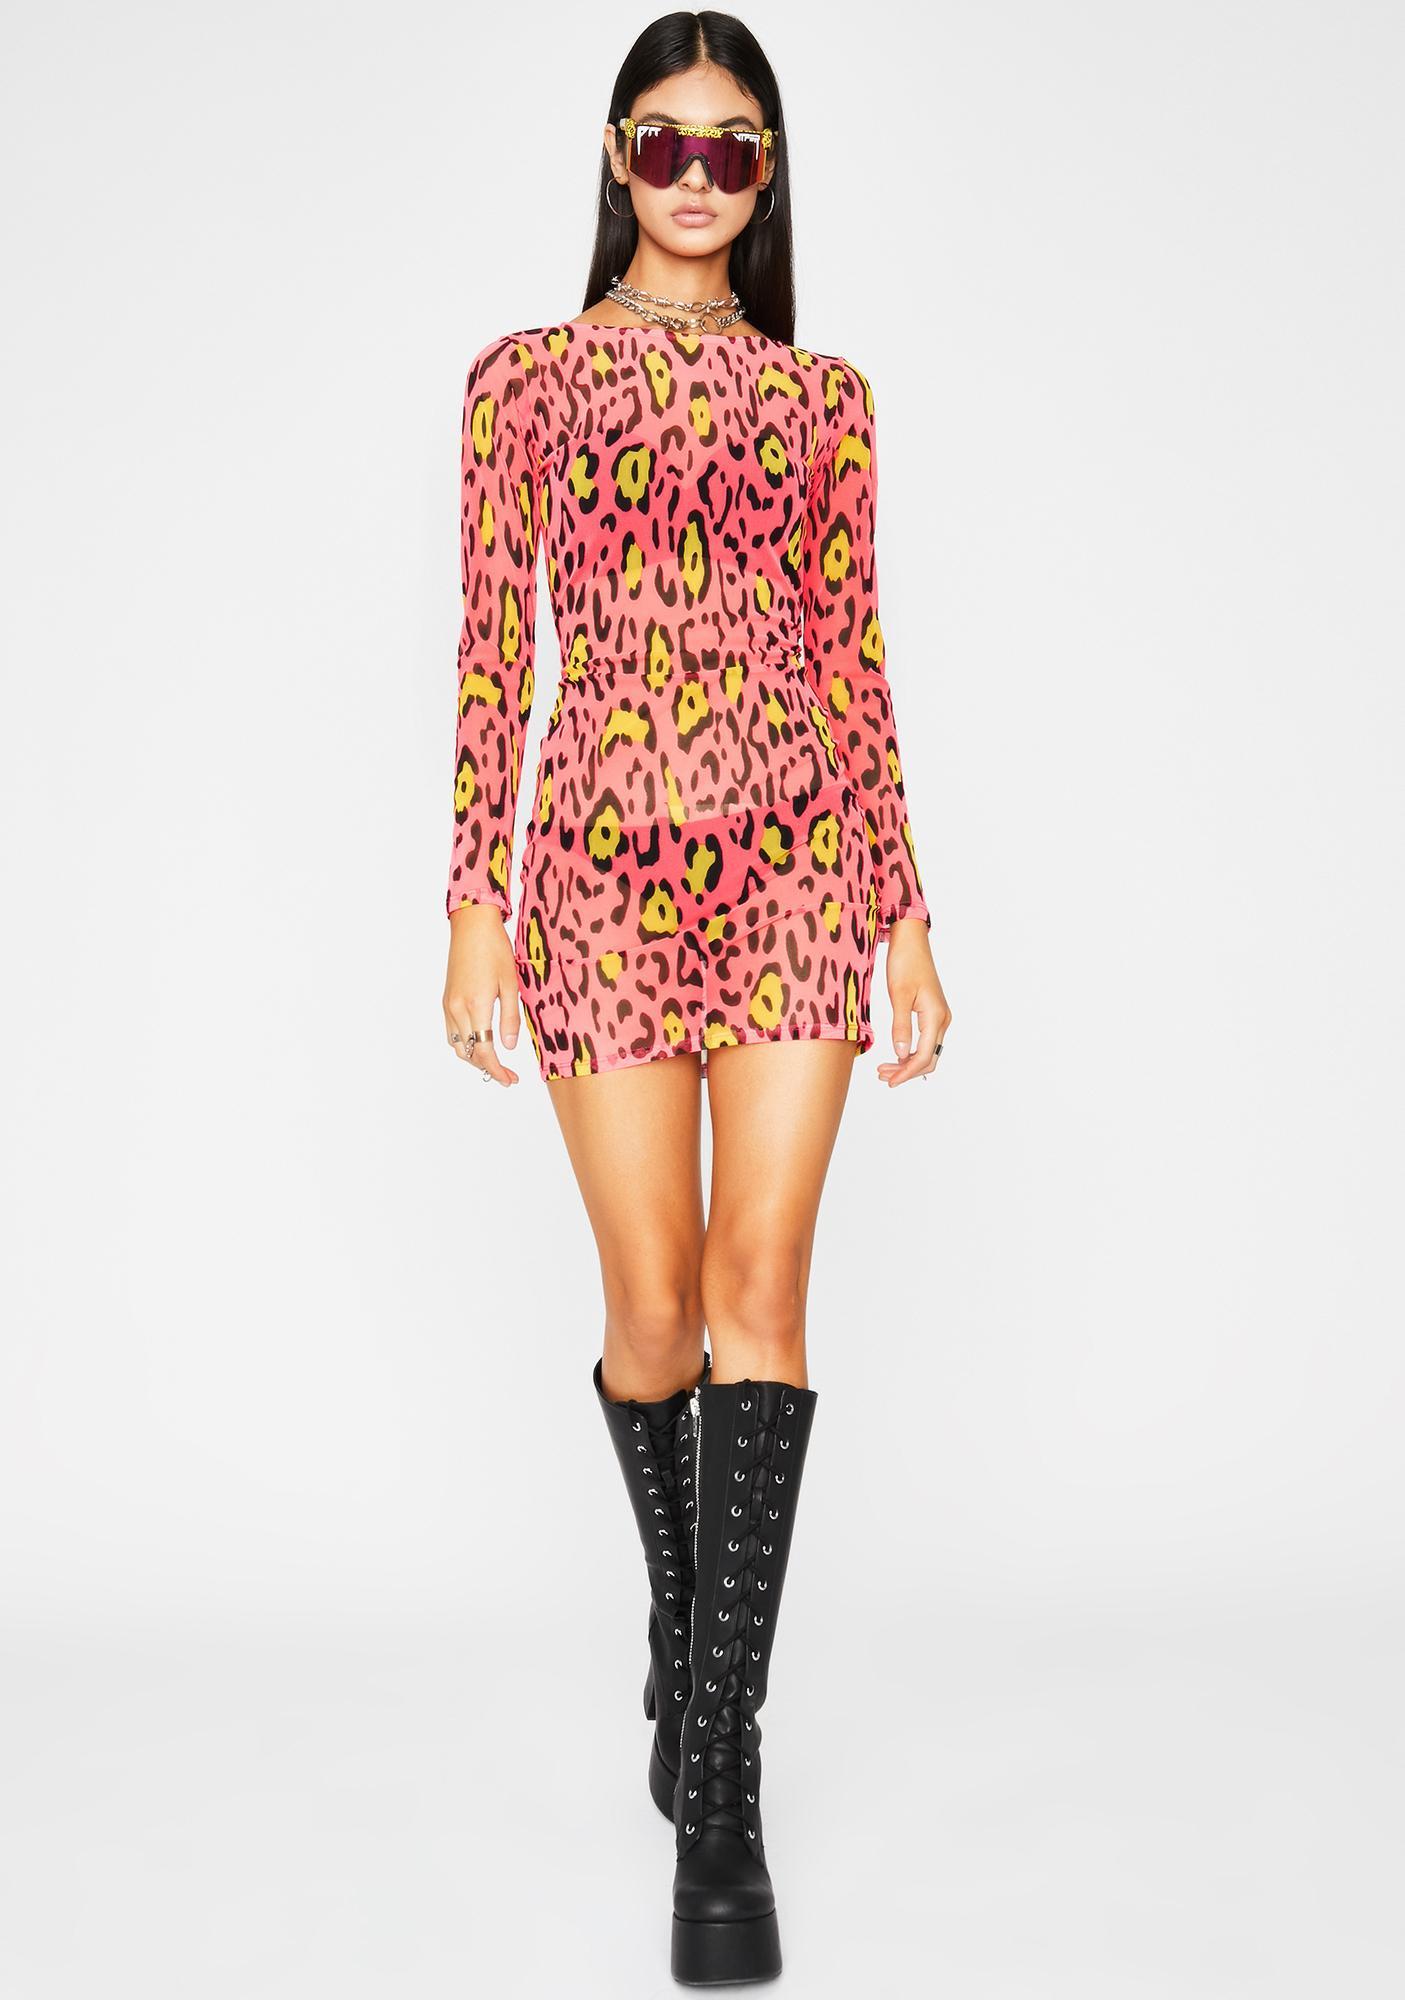 Neon Leopard Mesh Dress